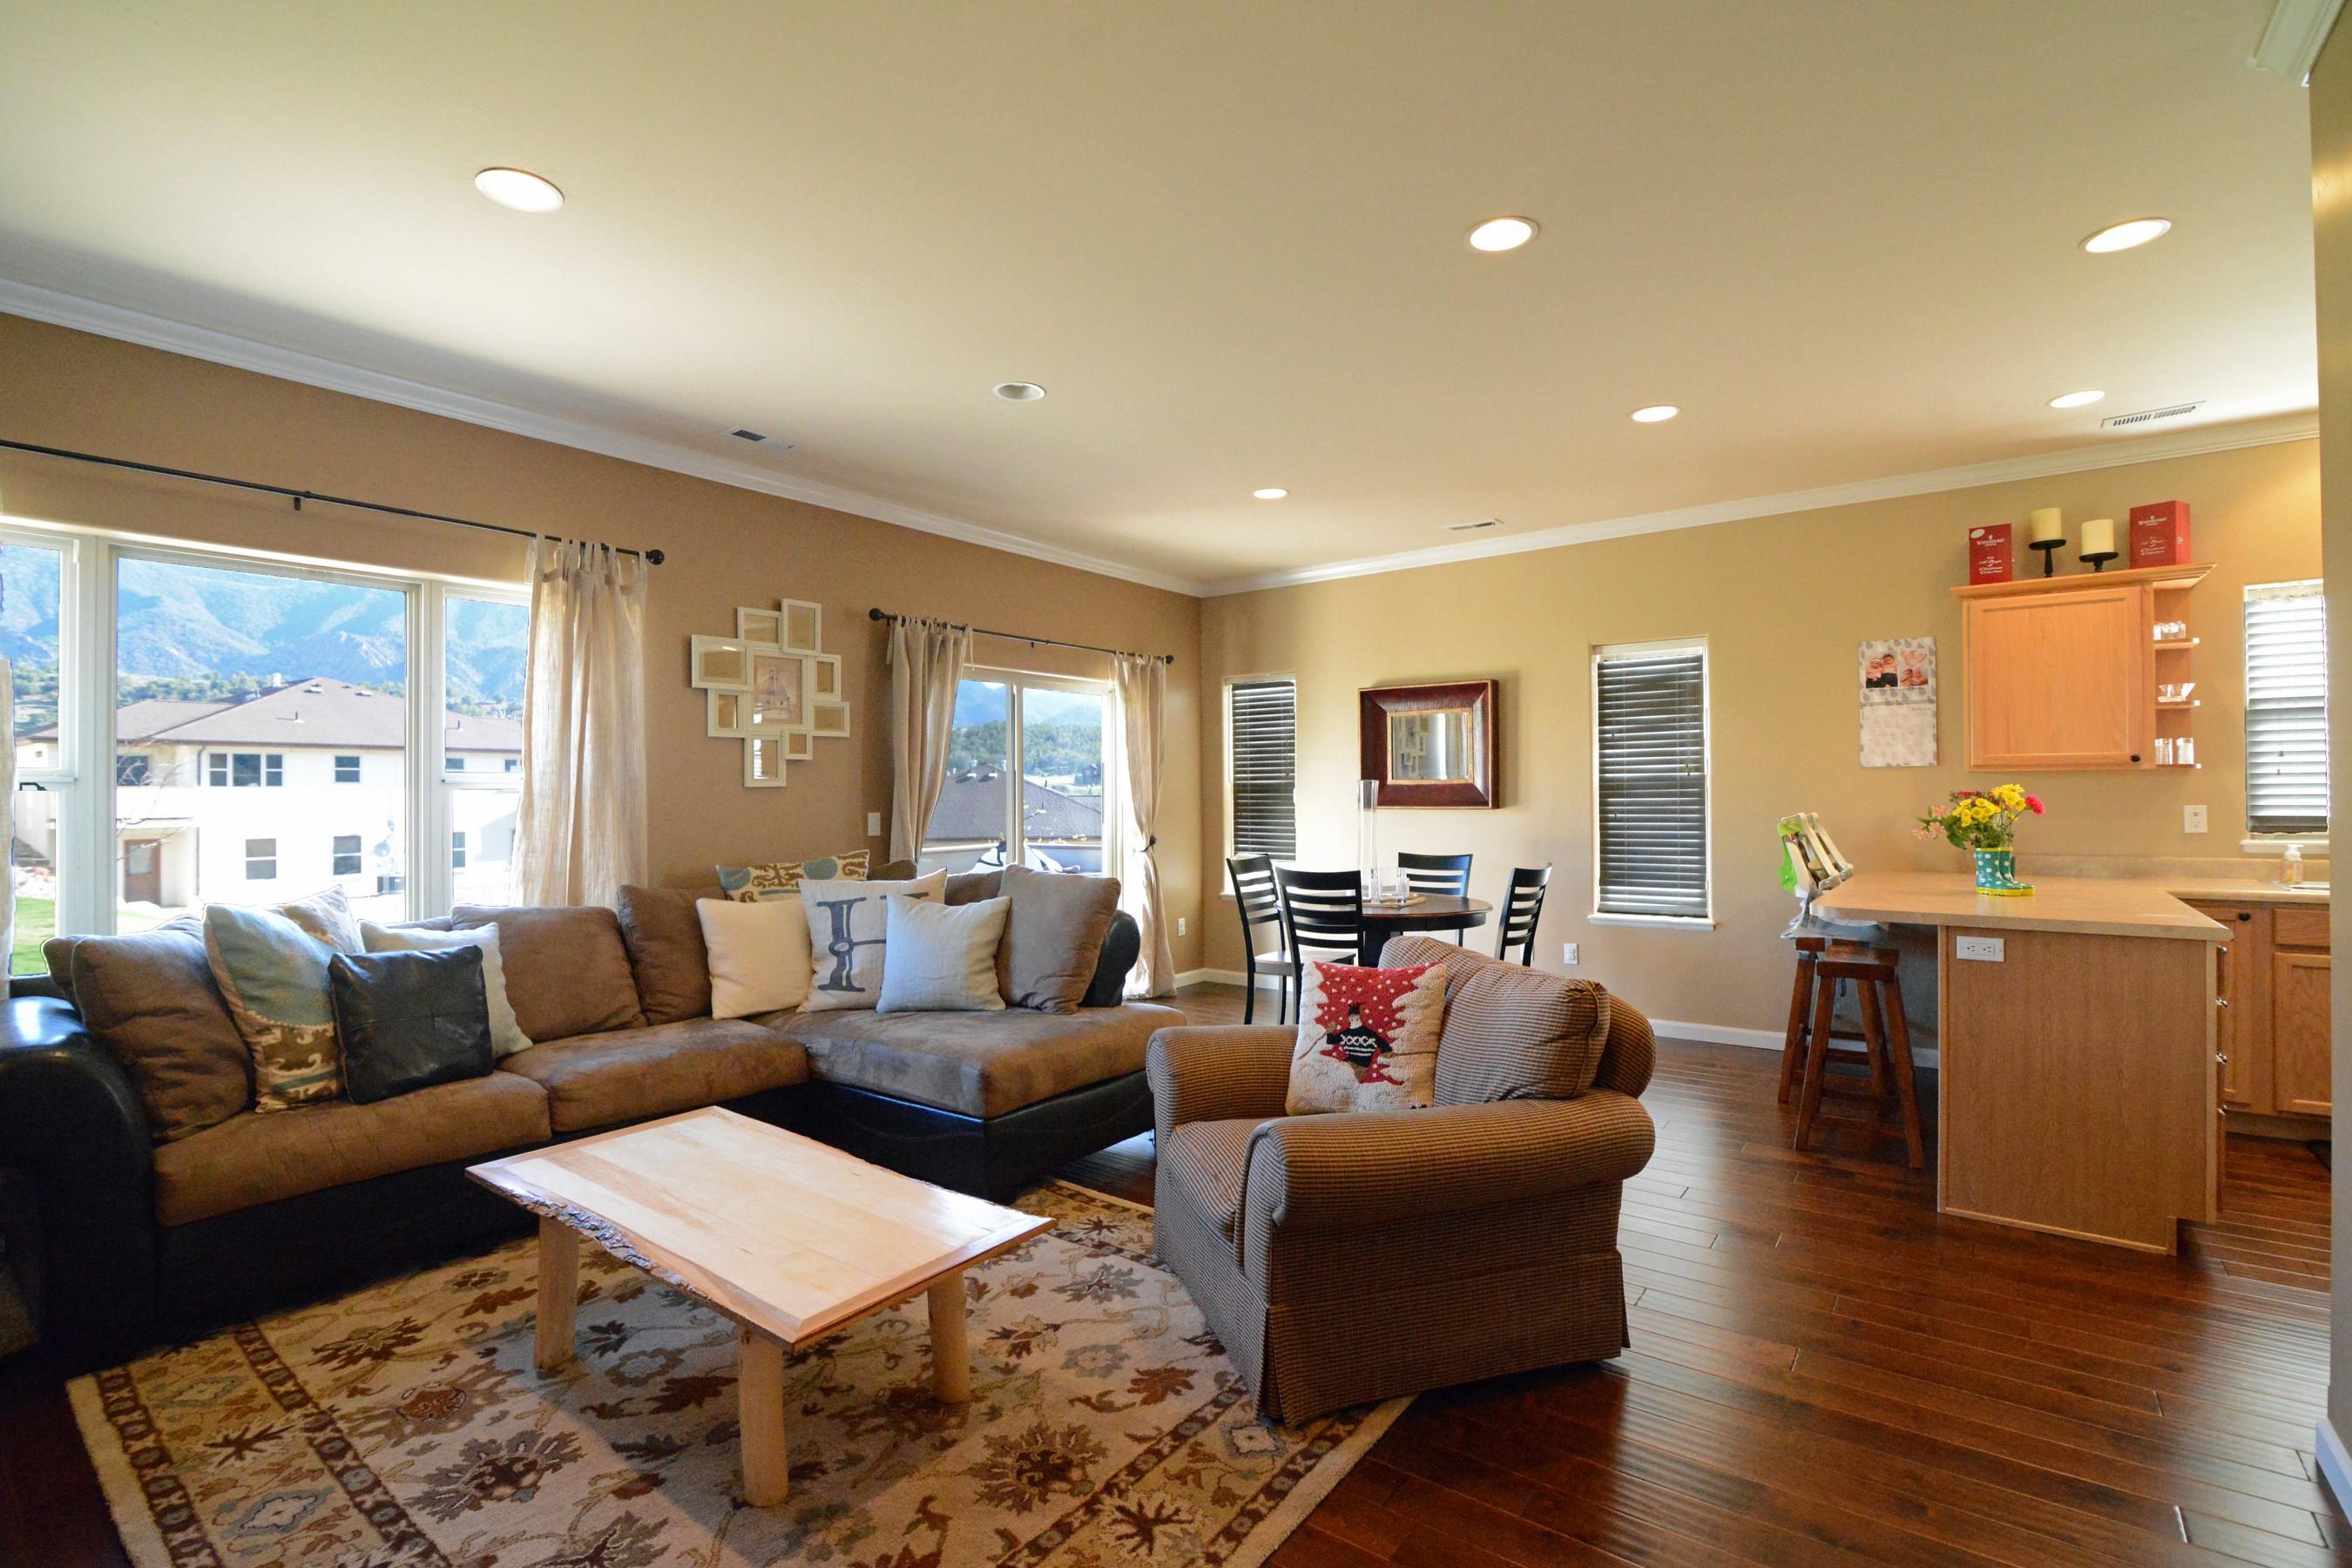 Duplex for Sale at Beautiful remodel in Castle Ridge! 277 Castle Ridge Drive New Castle, Colorado, 81647 United States